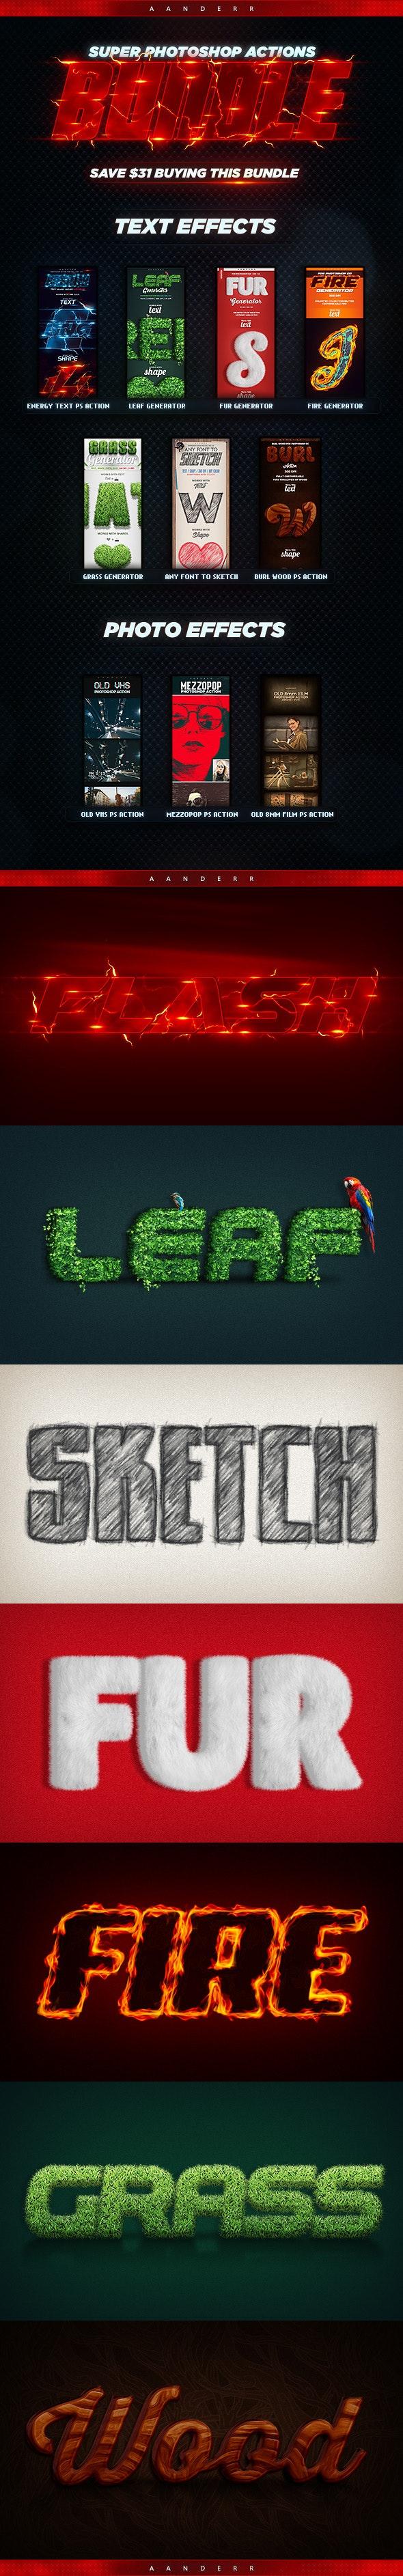 Super Photoshop Actions Bundle - Text Effects Styles